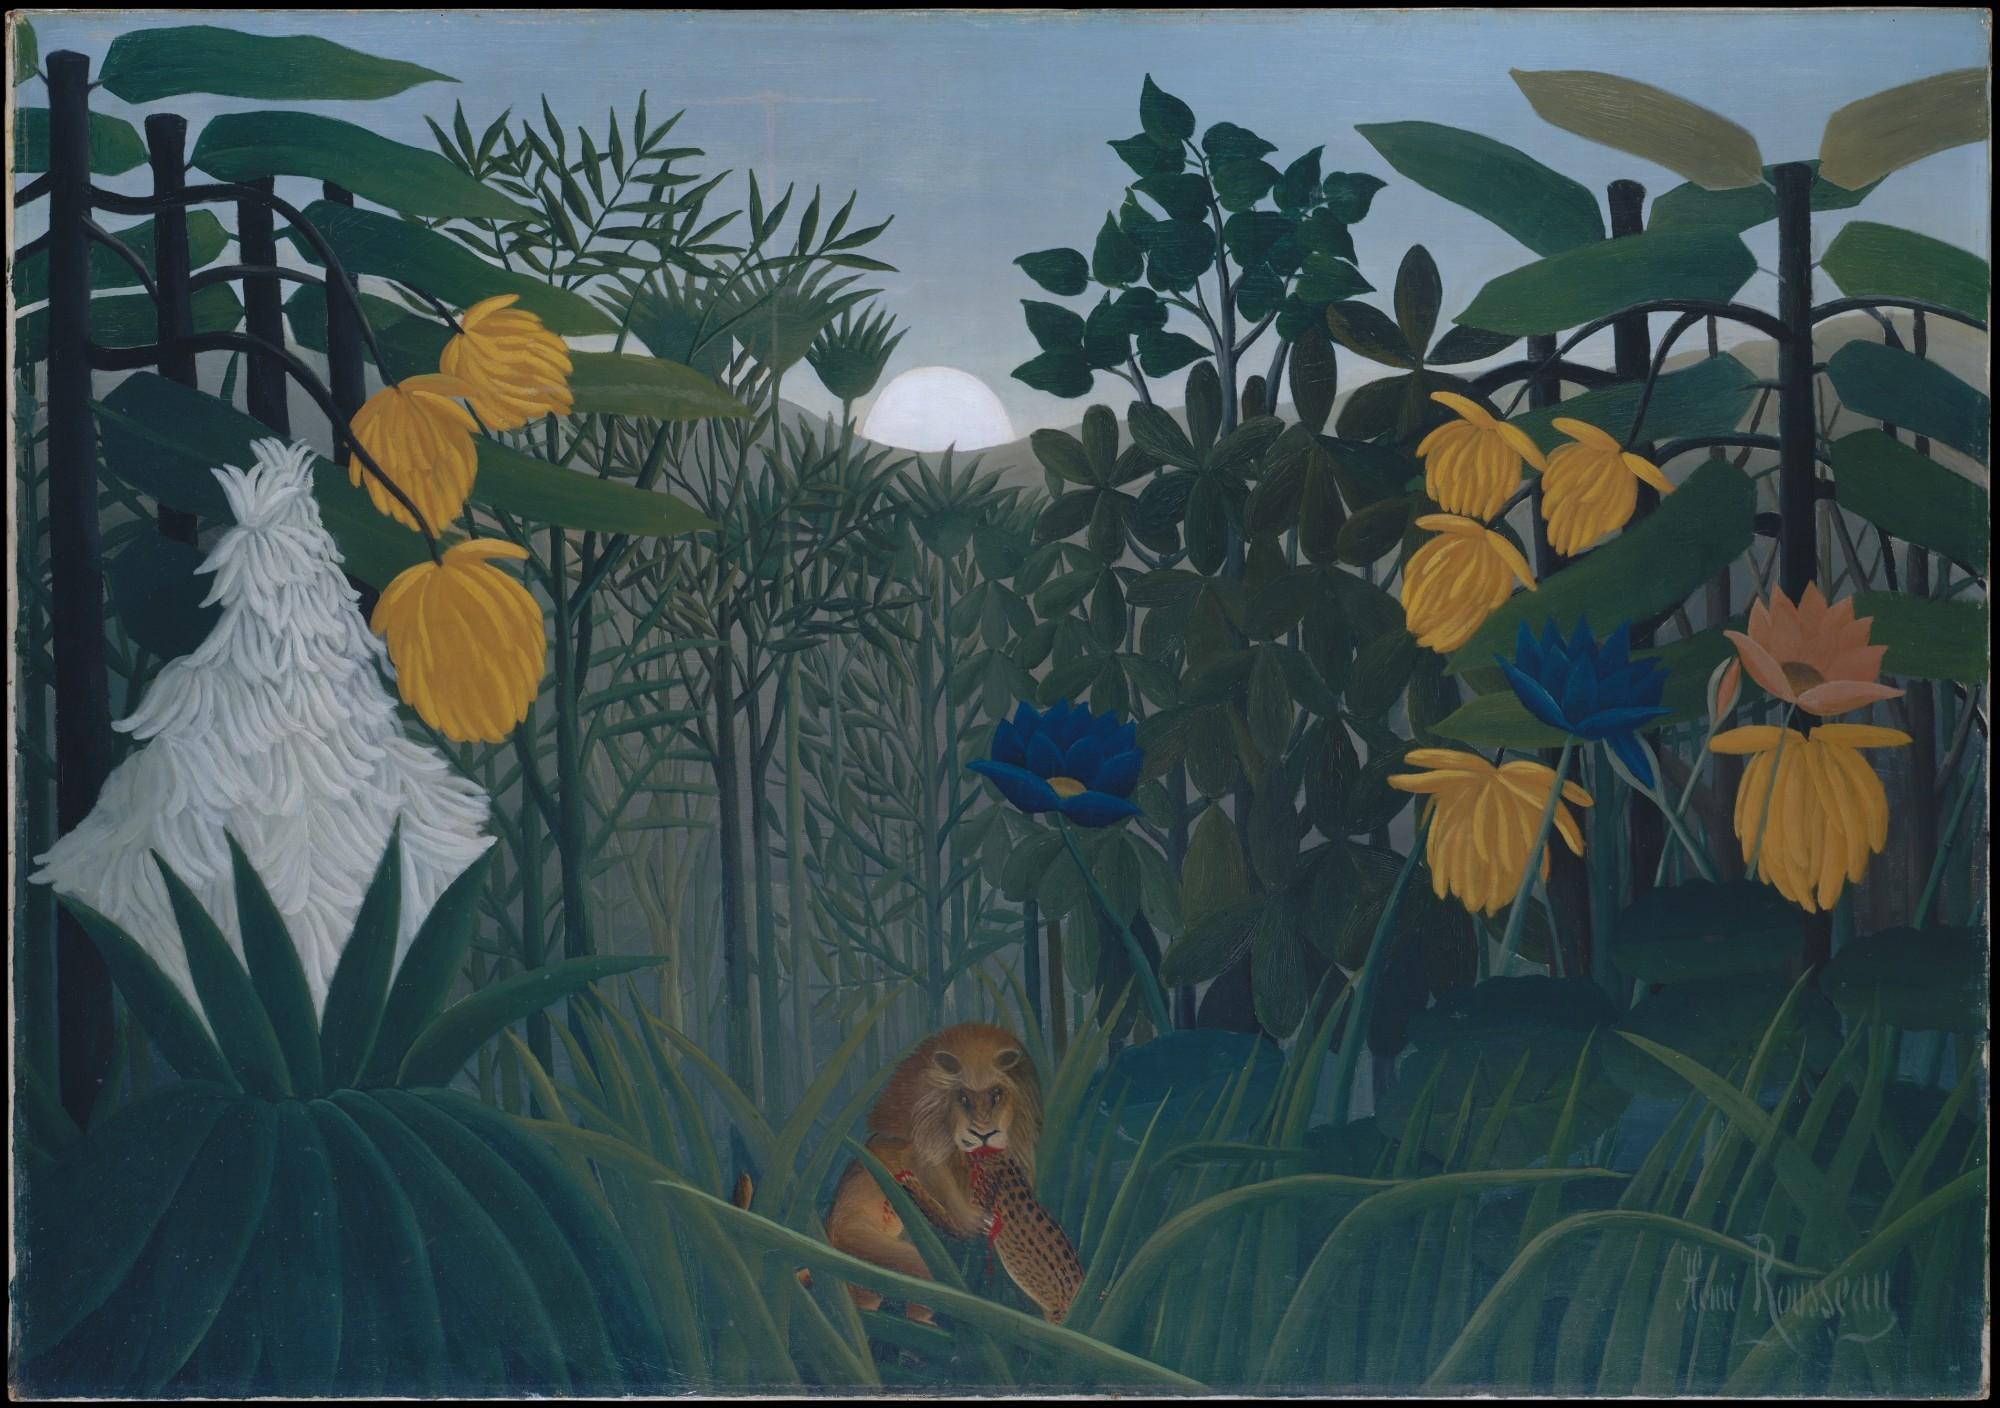 Henri Rousseau, Das Mahl des Löwen, um 1907. Öl auf Leinwand, 113,7 x 160 cm. The Metropolitan Museum of Art, New York.